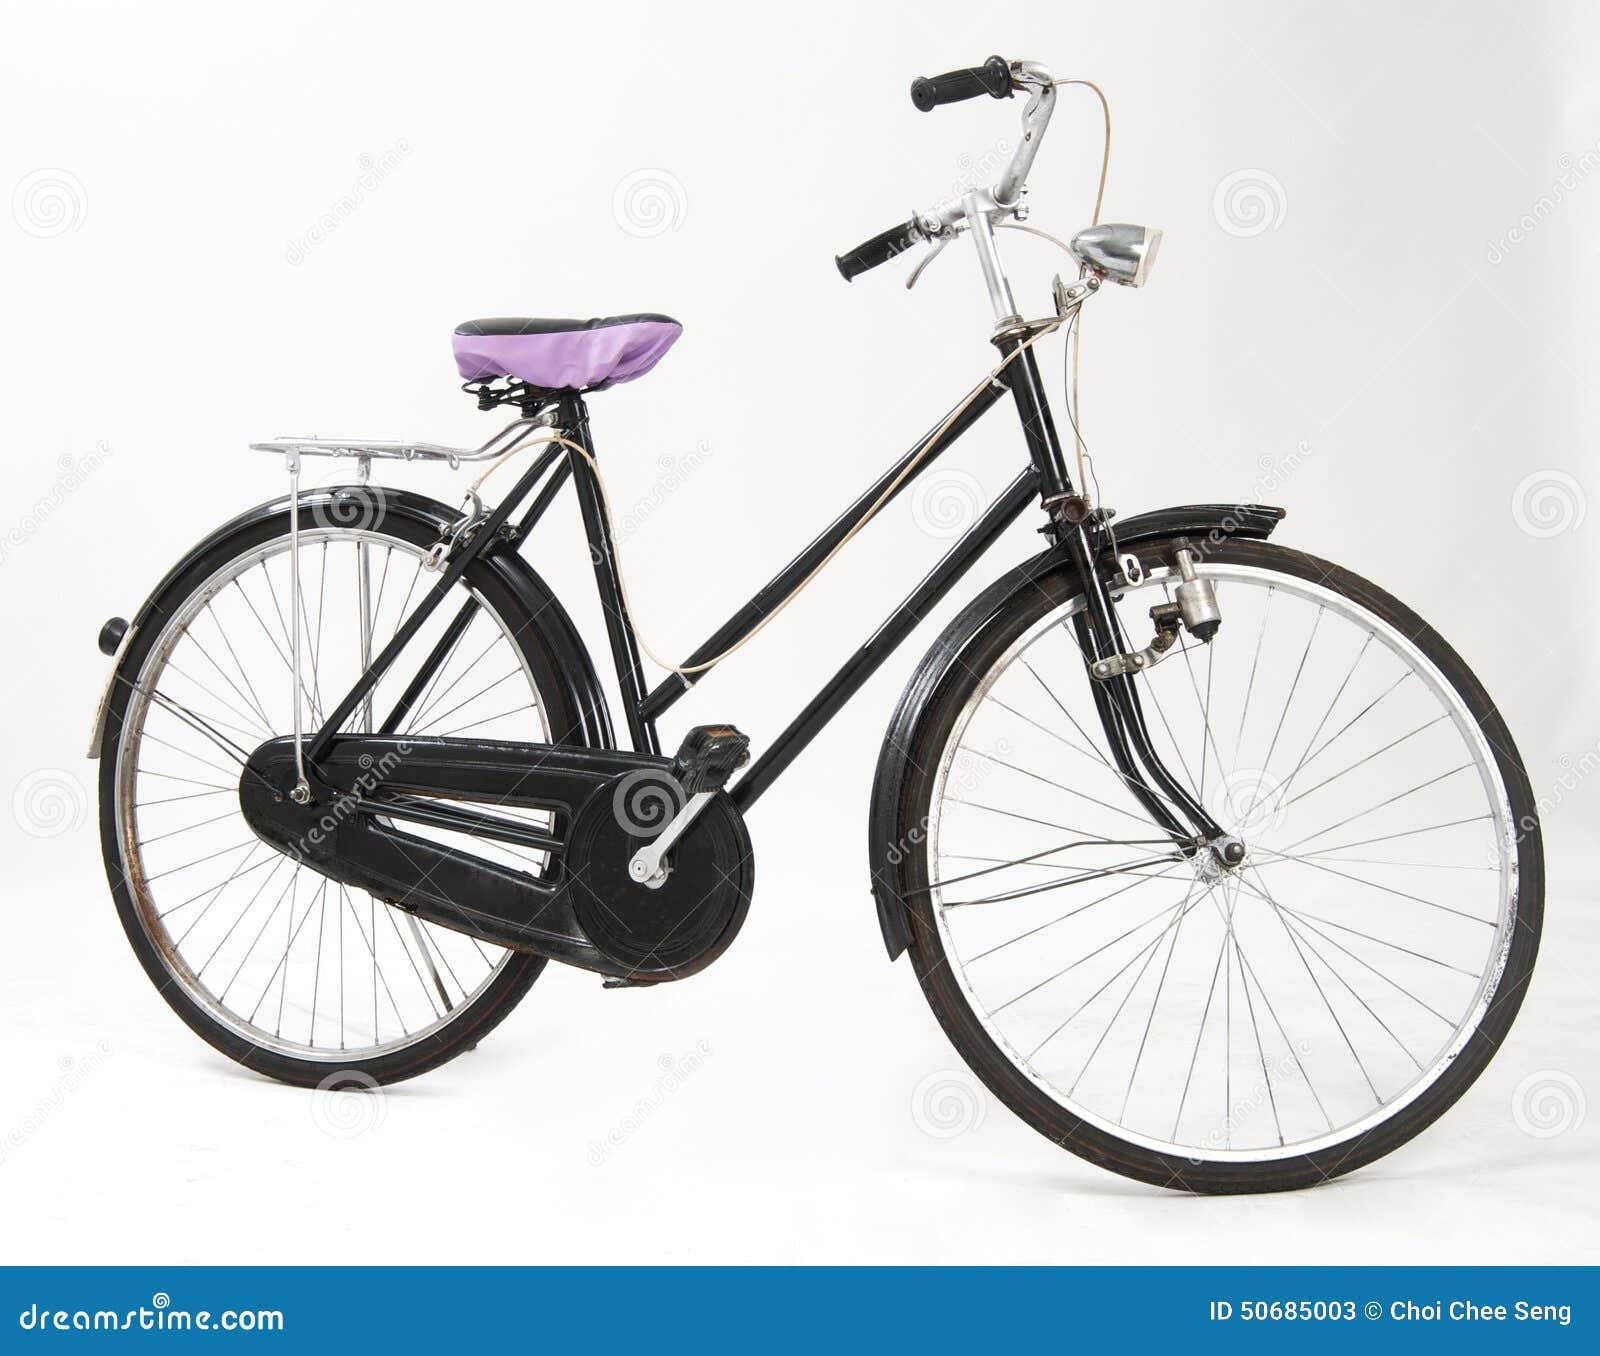 Download 老自行车 库存图片. 图片 包括有 循环, 对象, 过去, 投反对票, 塑造, 自行车骑士, 经典, 葡萄酒 - 50685003